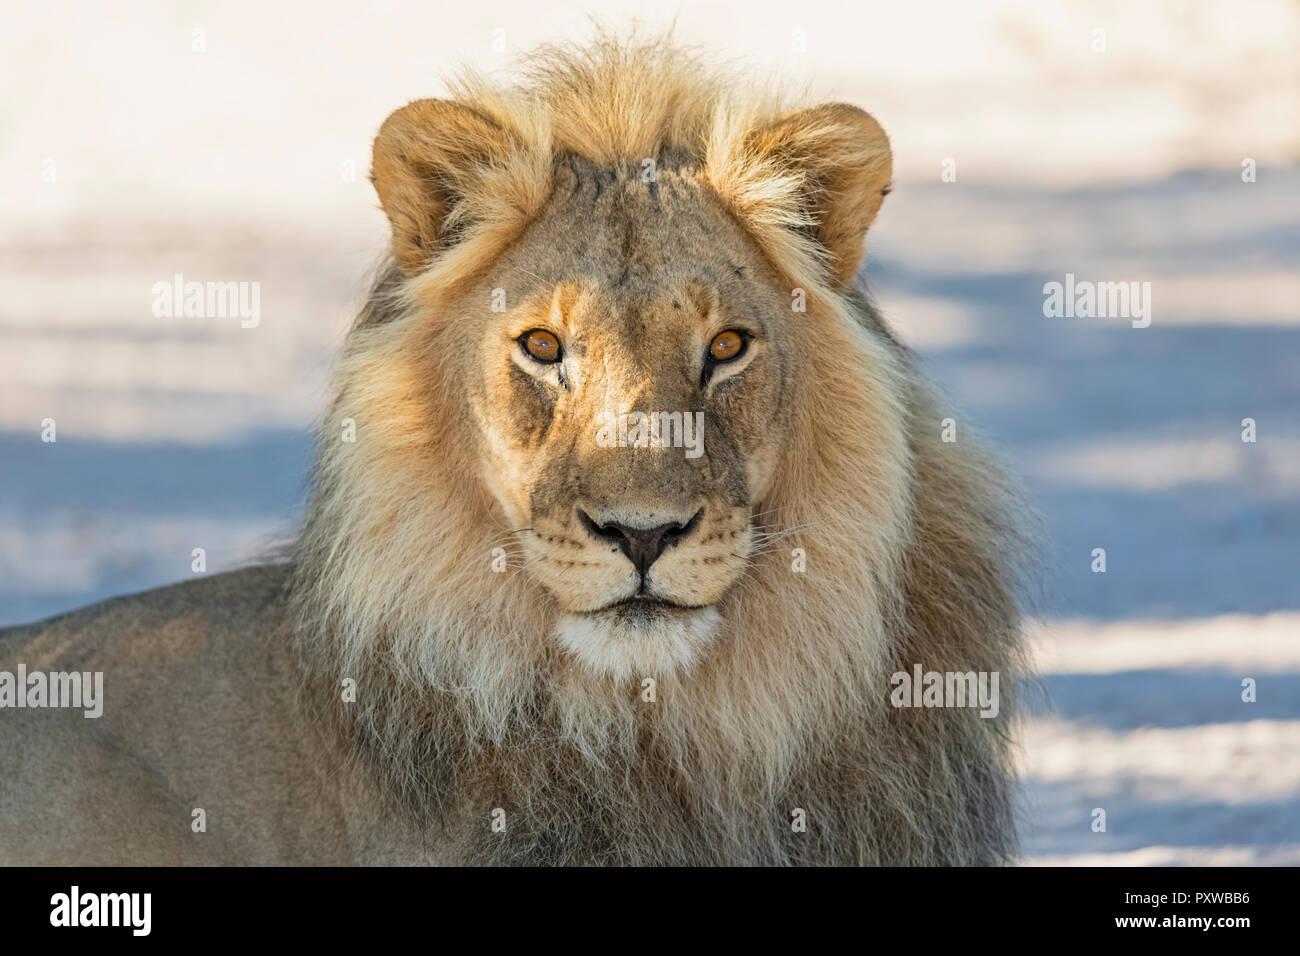 Botswana, Kgalagadi Transfrontier Park, lion, Panthera leo, male - Stock Image